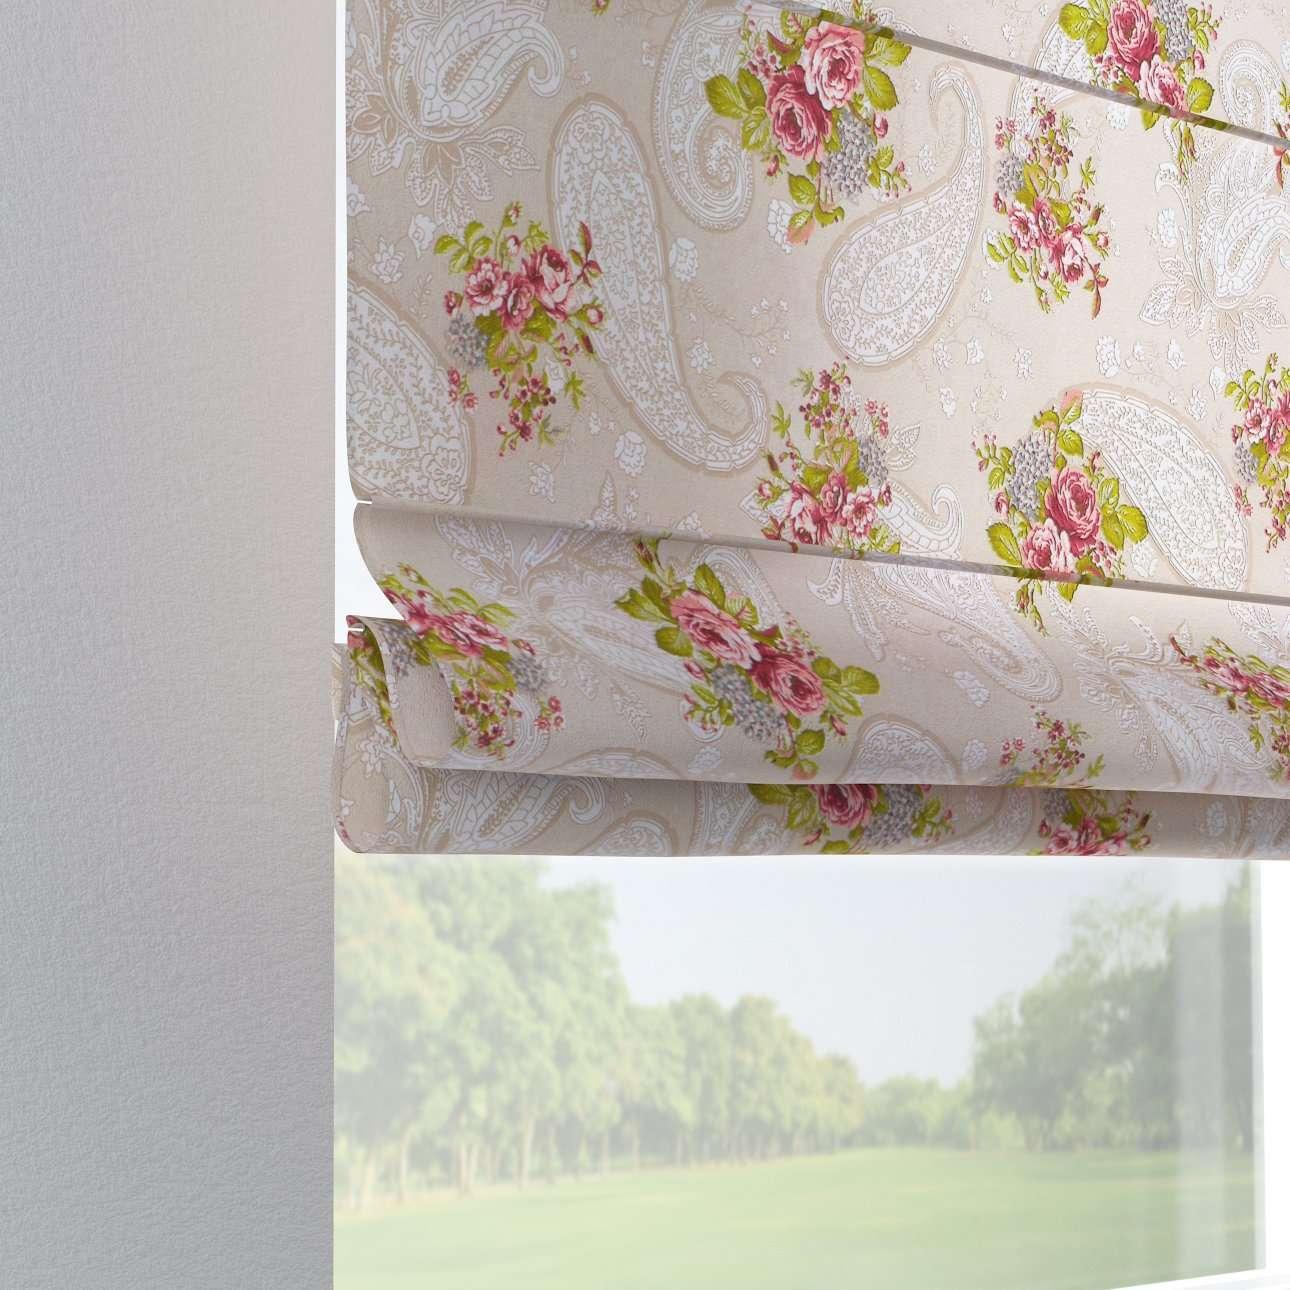 Foldegardin Verona<br/>Med stropper til gardinstang 80 x 170 cm fra kollektionen Flowers, Stof: 311-15